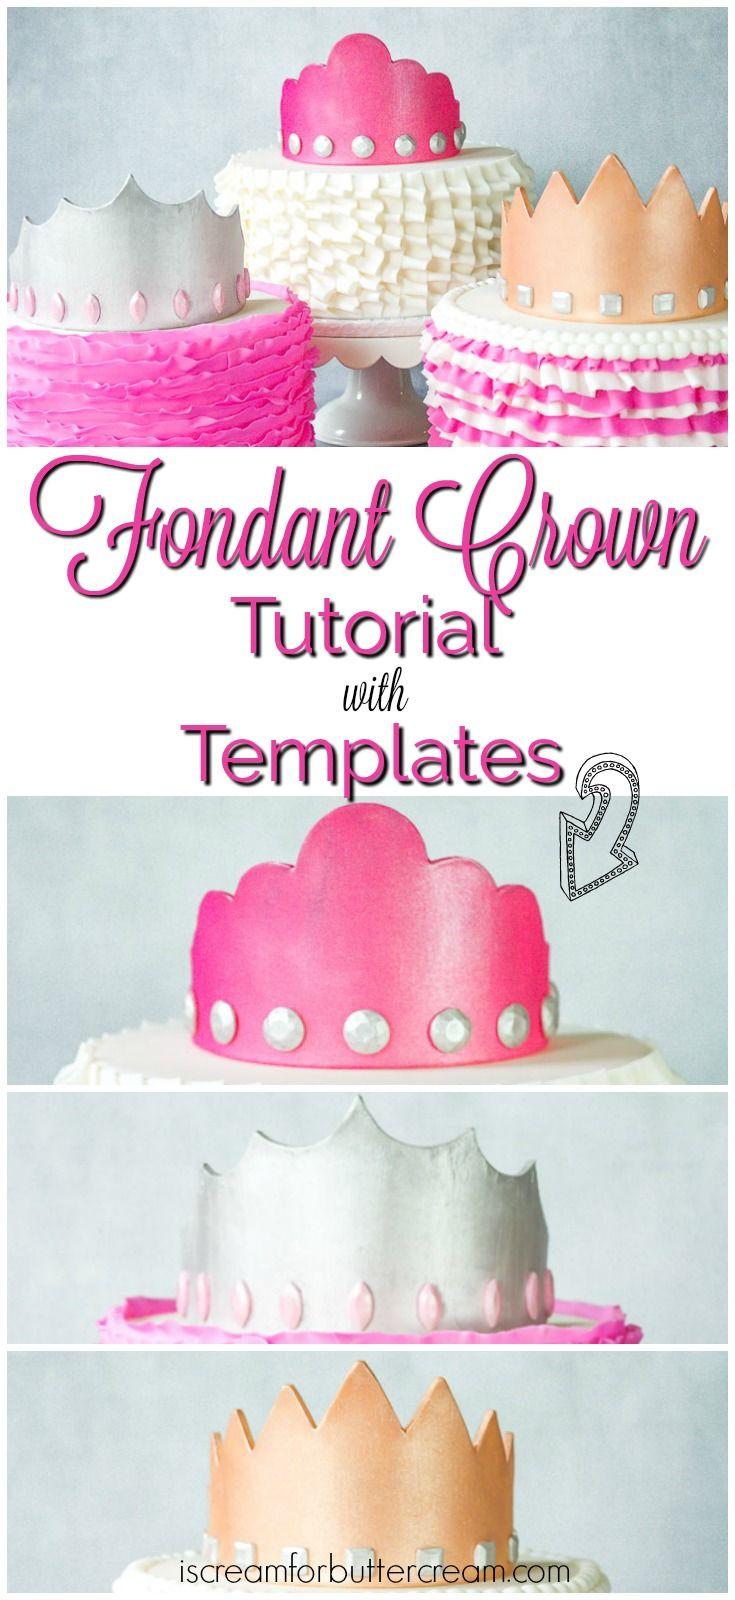 Fondant Crown Tutorial with Templates   Tortilla